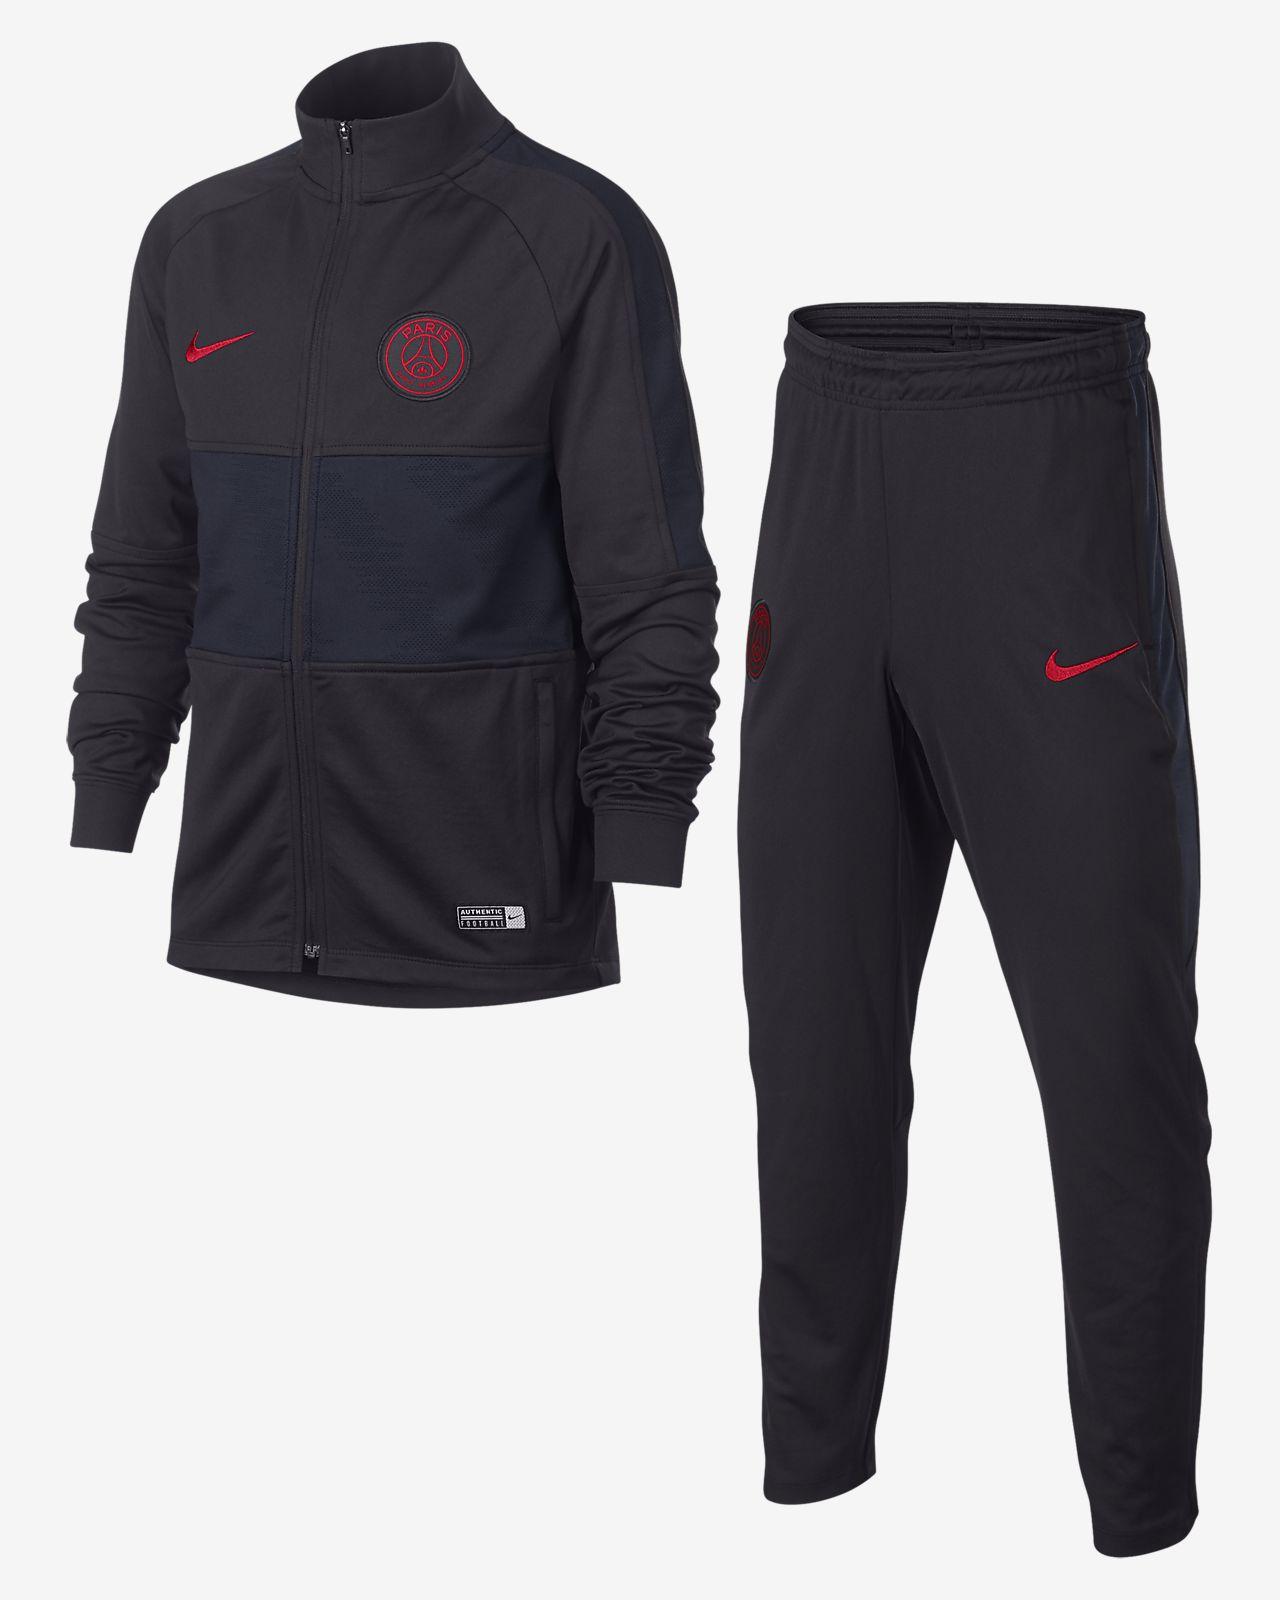 Fotbollstracksuit Nike Dri-FIT Paris Saint-Germain Strike för ungdom